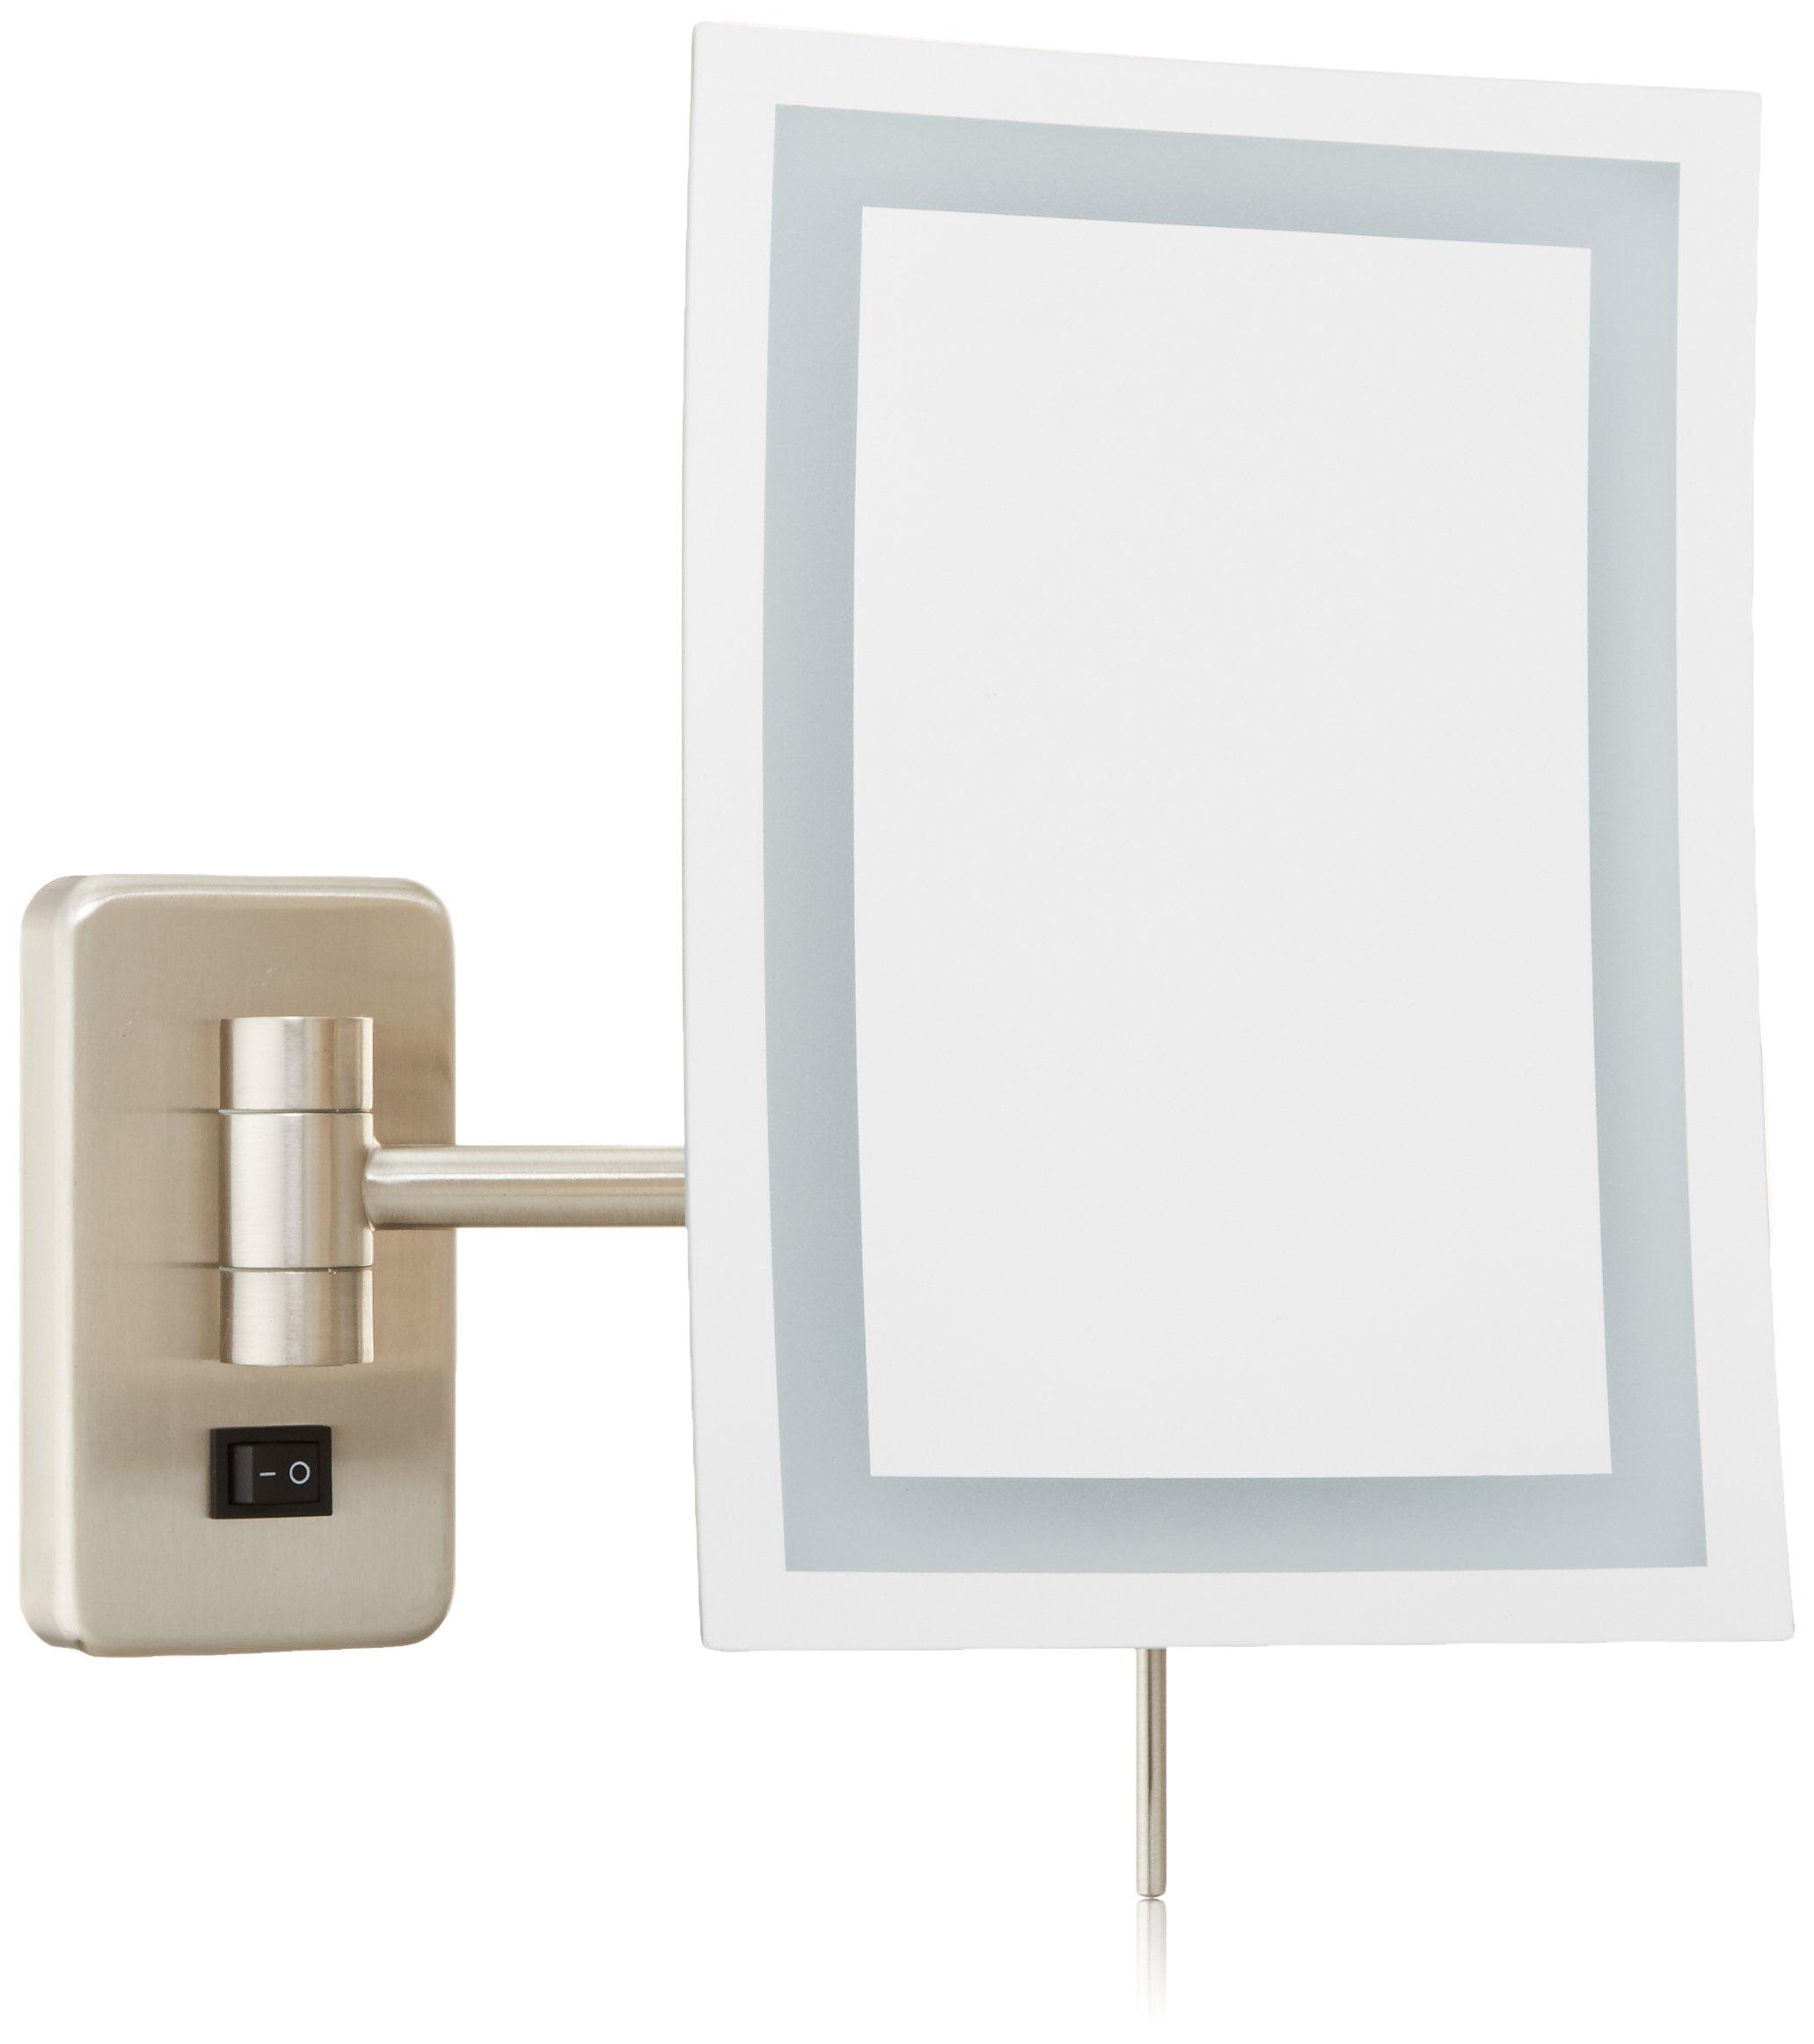 Jerdon JRT710NLD Wall Mount Rectangular Direct Wire Makeup Mirror, Nickel Finish, 6.5'' x 9'' by Jerdon